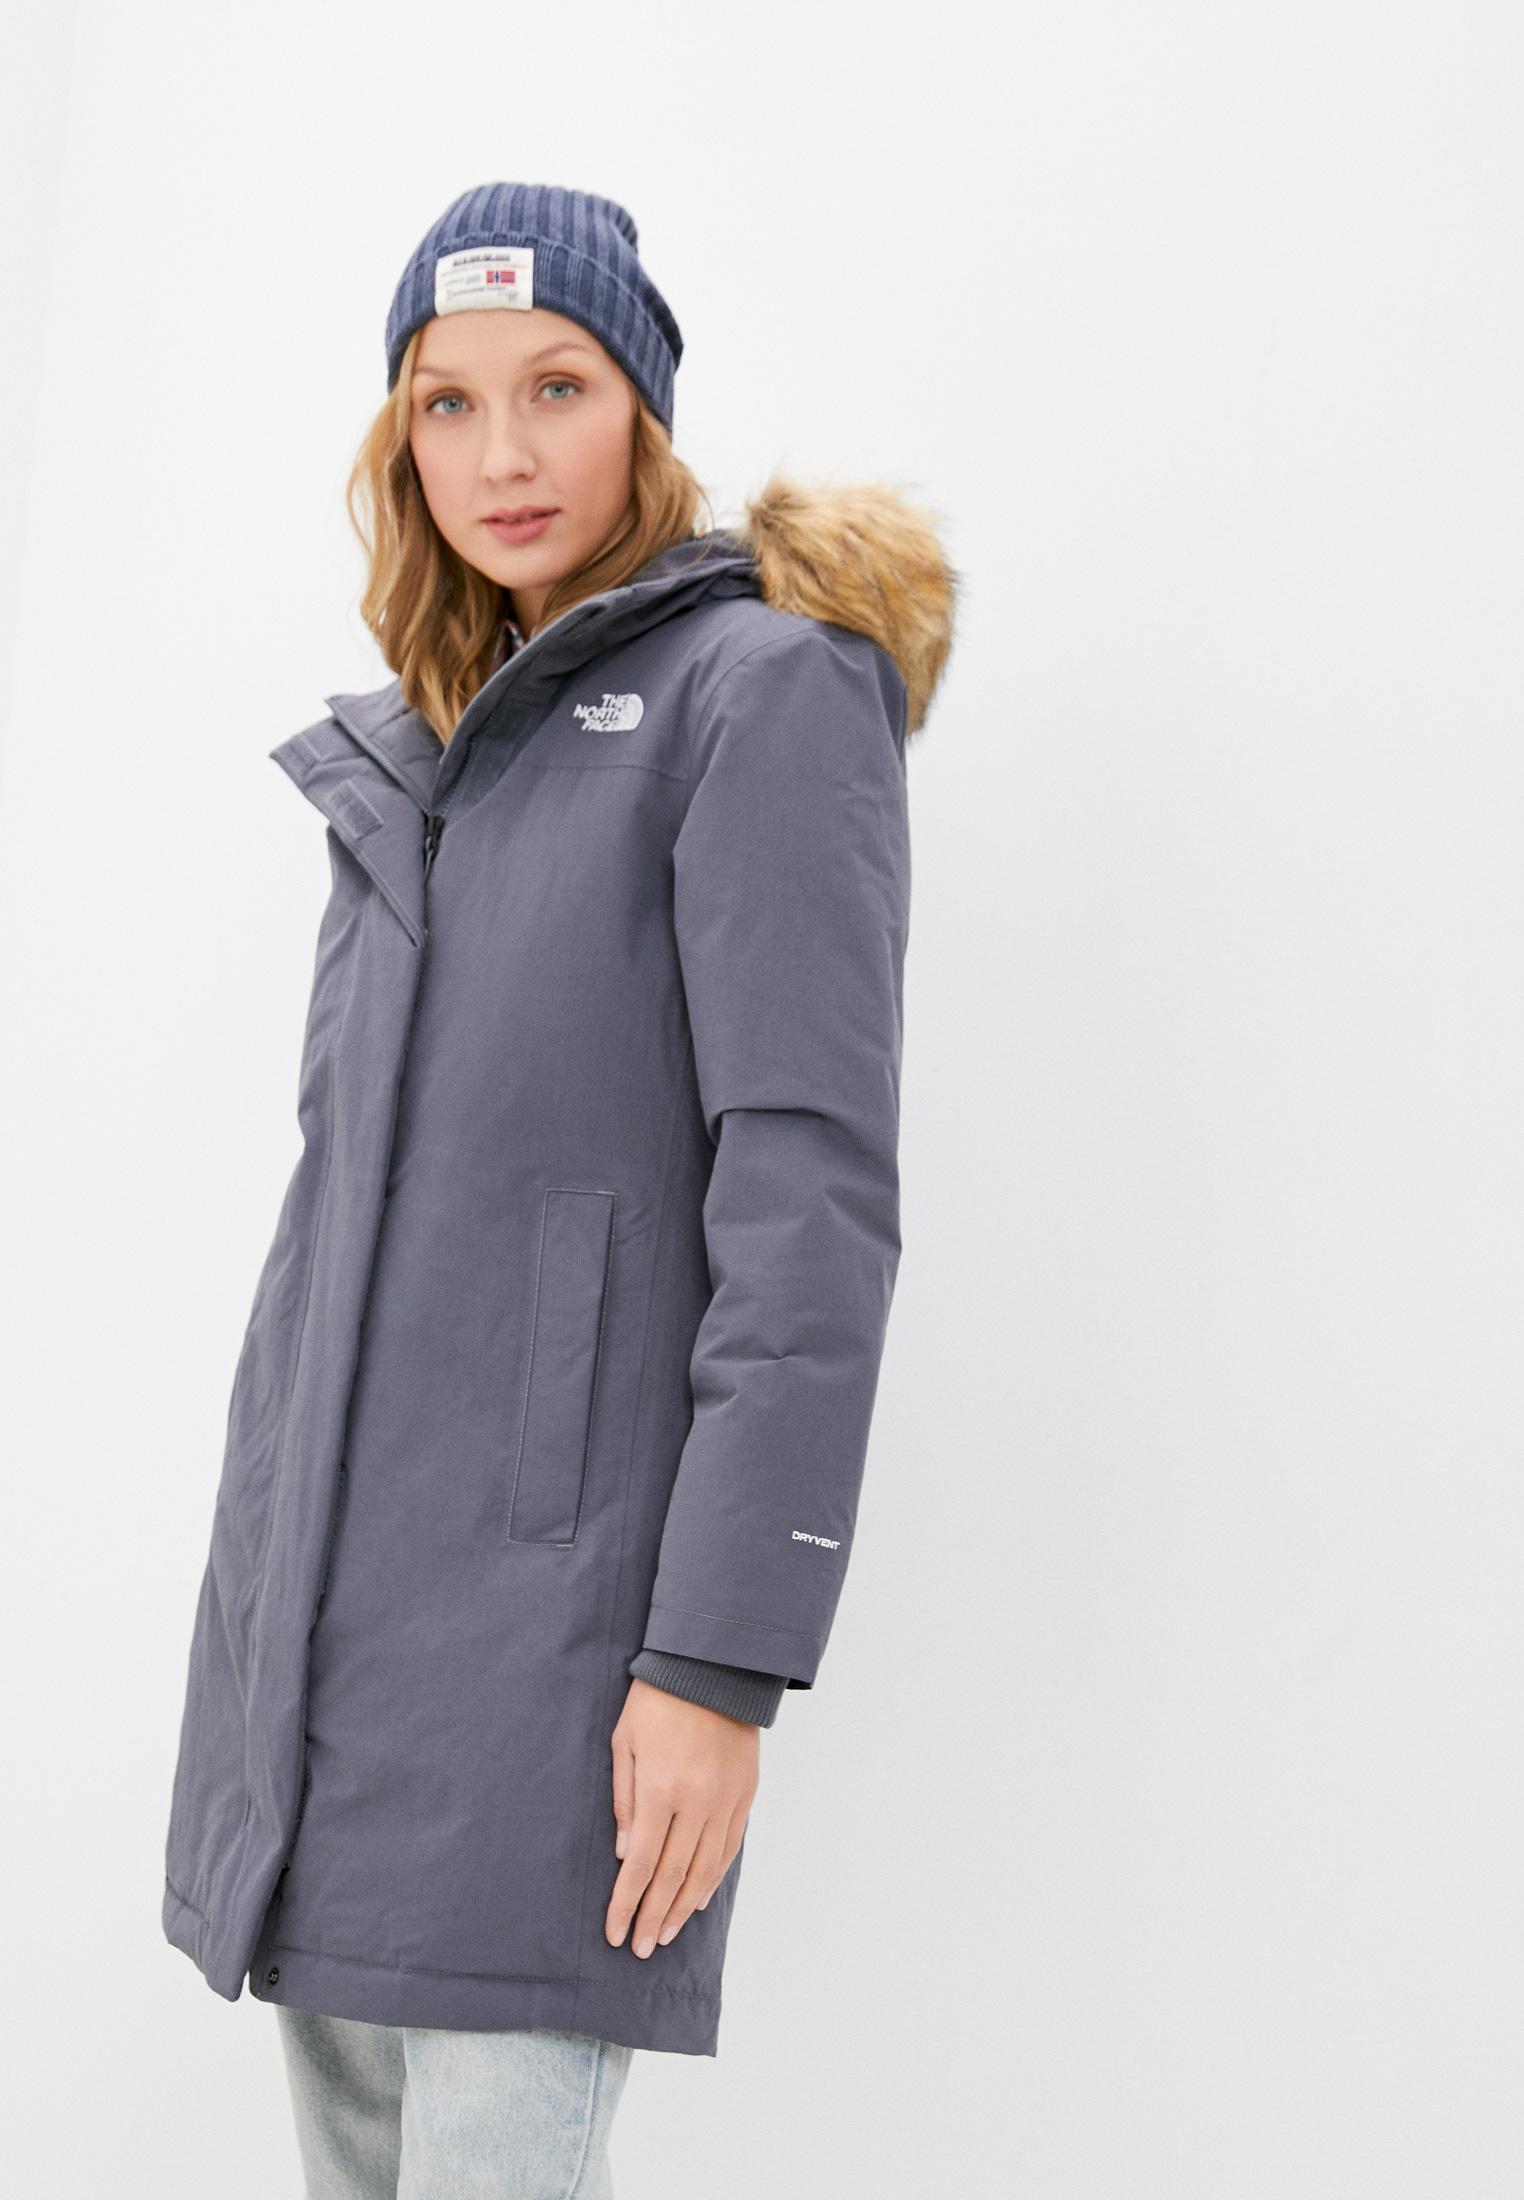 Женская верхняя одежда The North Face (Зе Норт Фейс) TA4R2V174